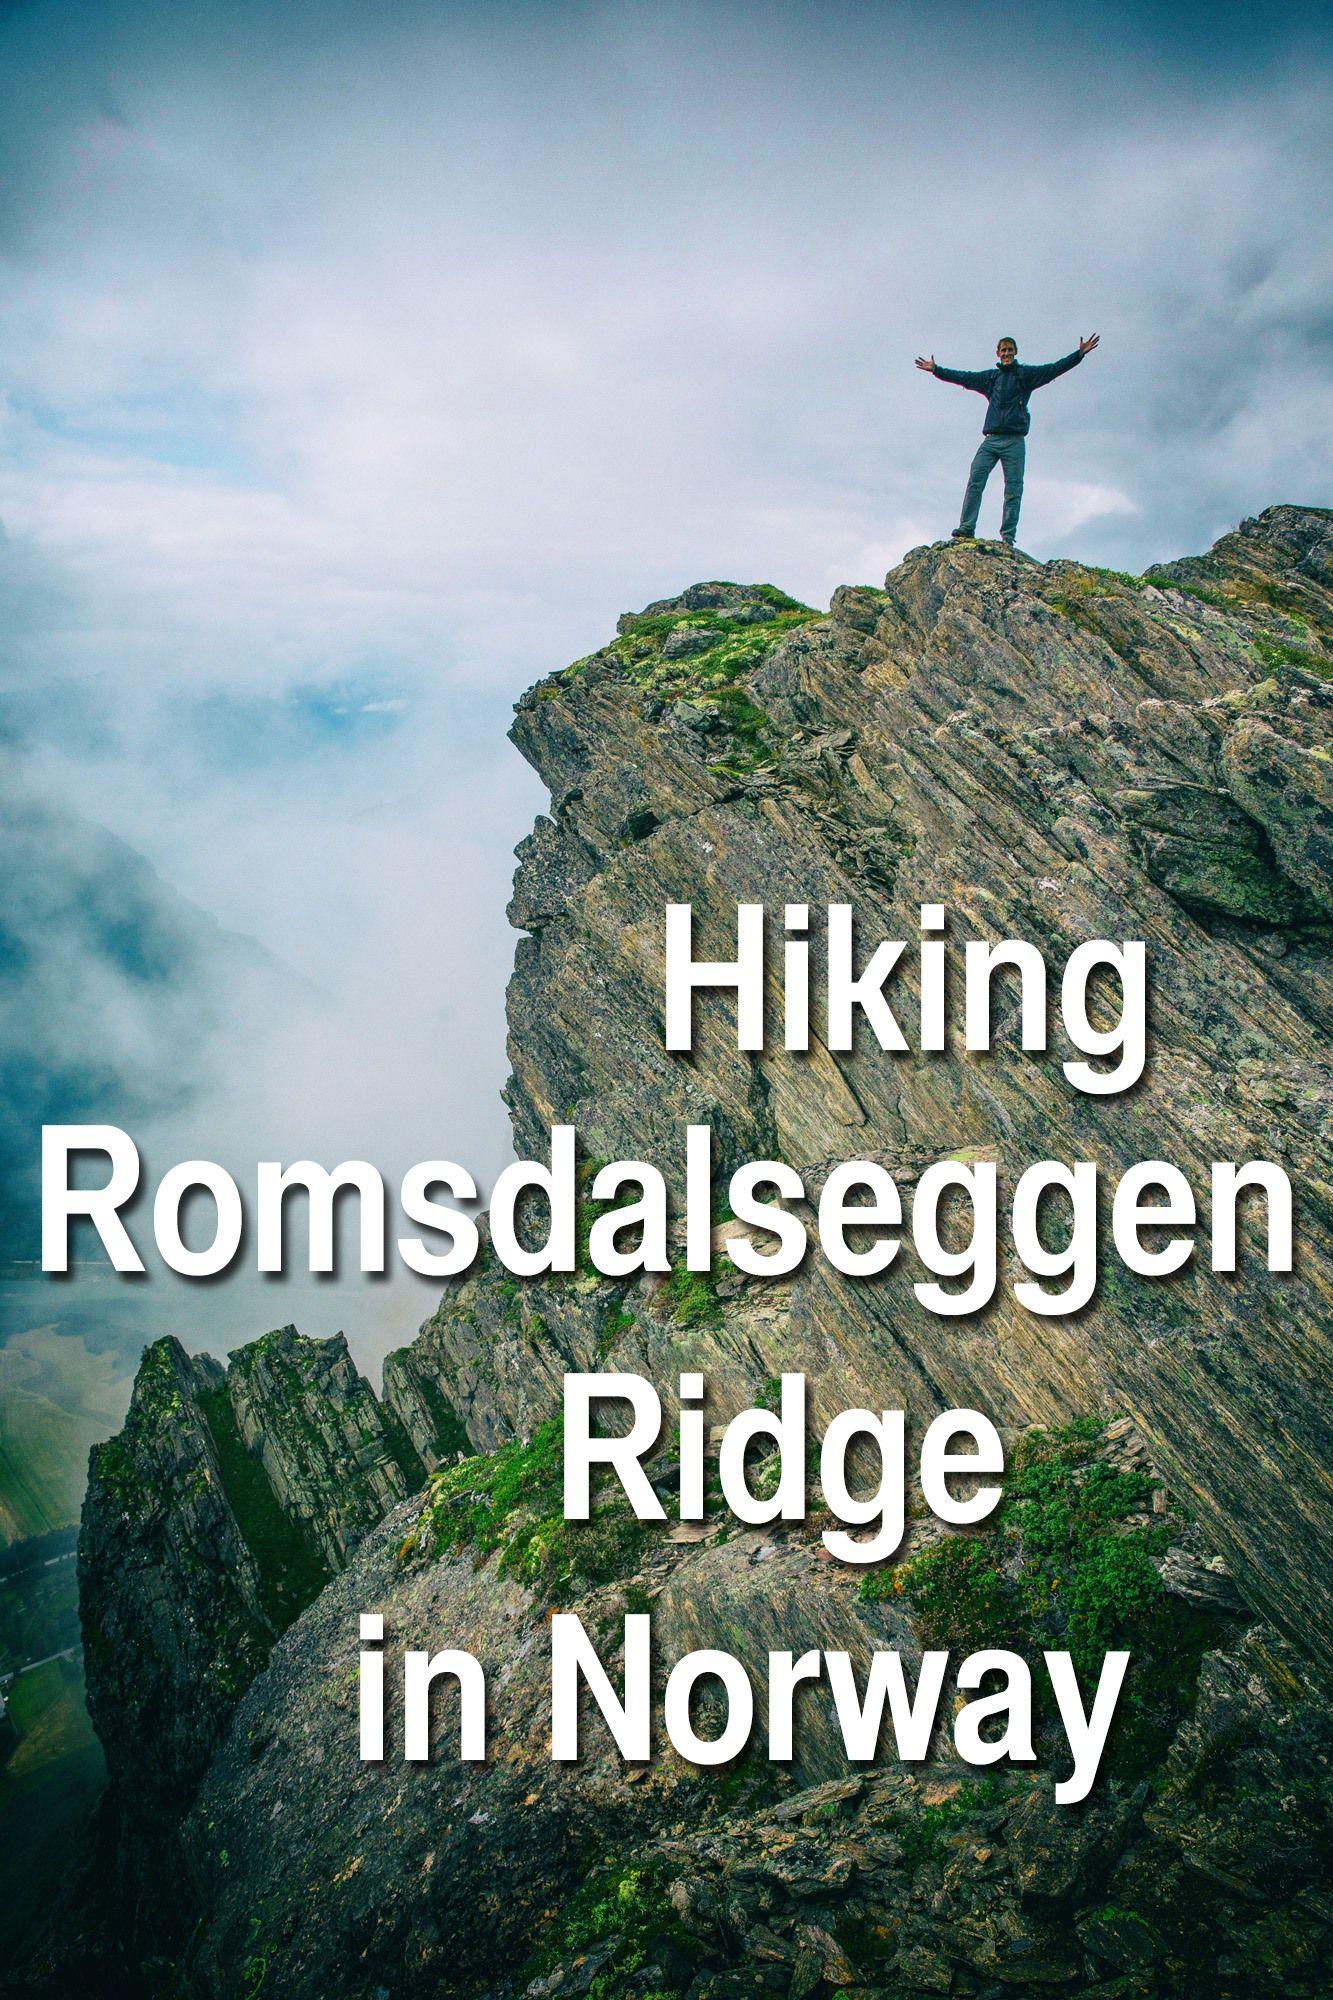 Romsdalseggen Ridge Norway